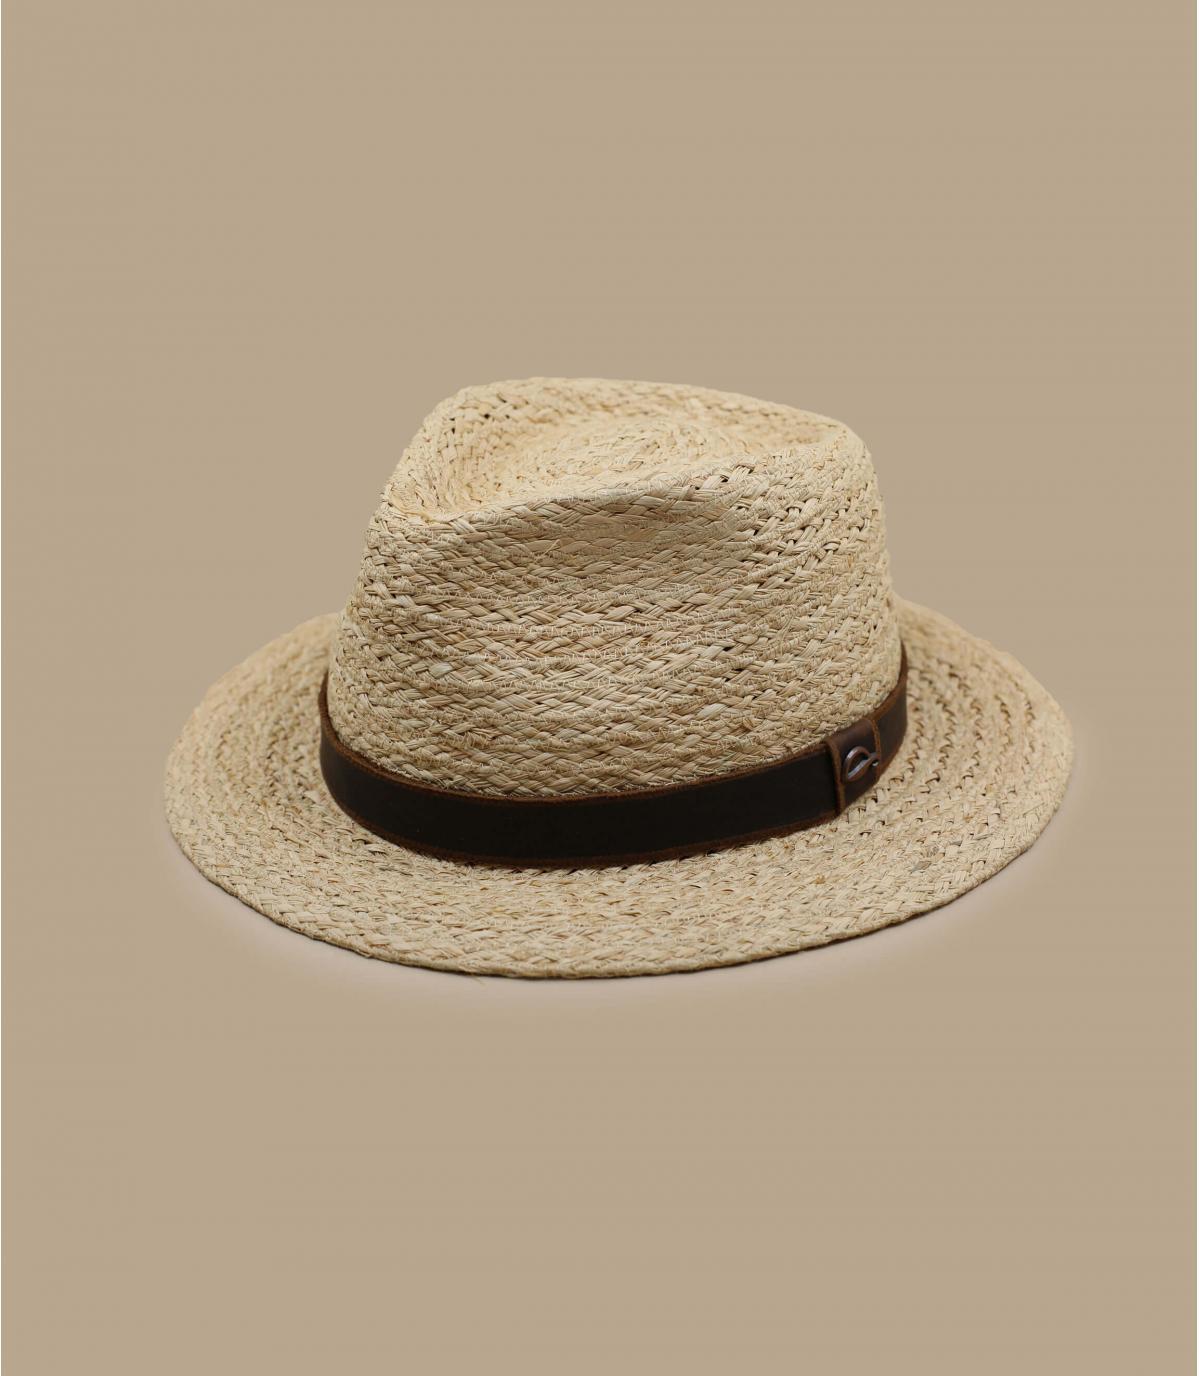 Sombrero rafia lazo cuero